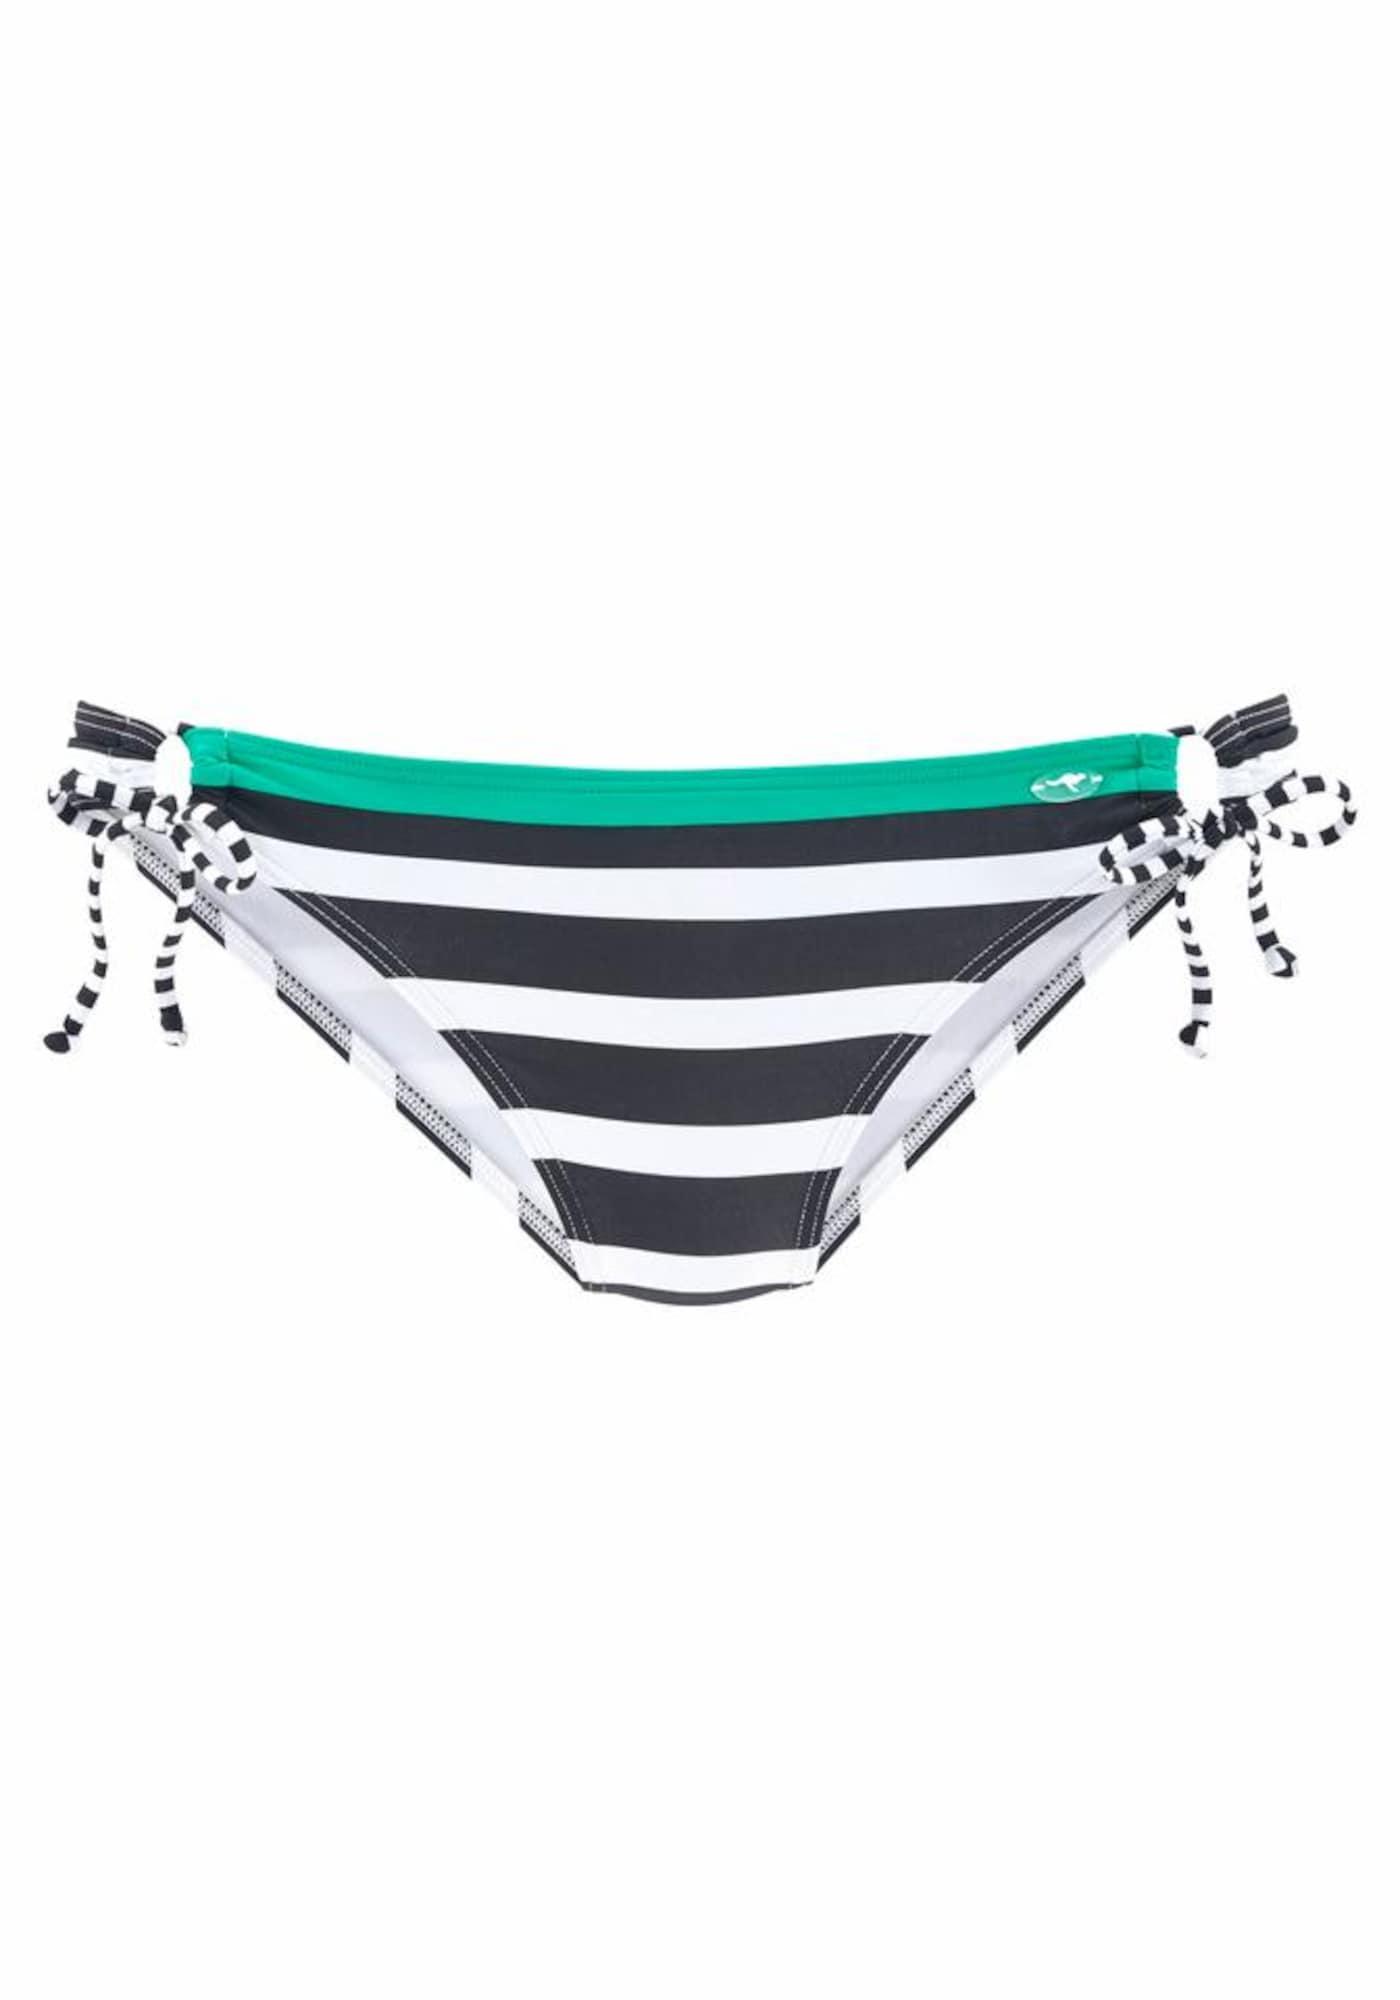 KangaROOS, Dames Bikinibroek, jade groen / zwart / wit